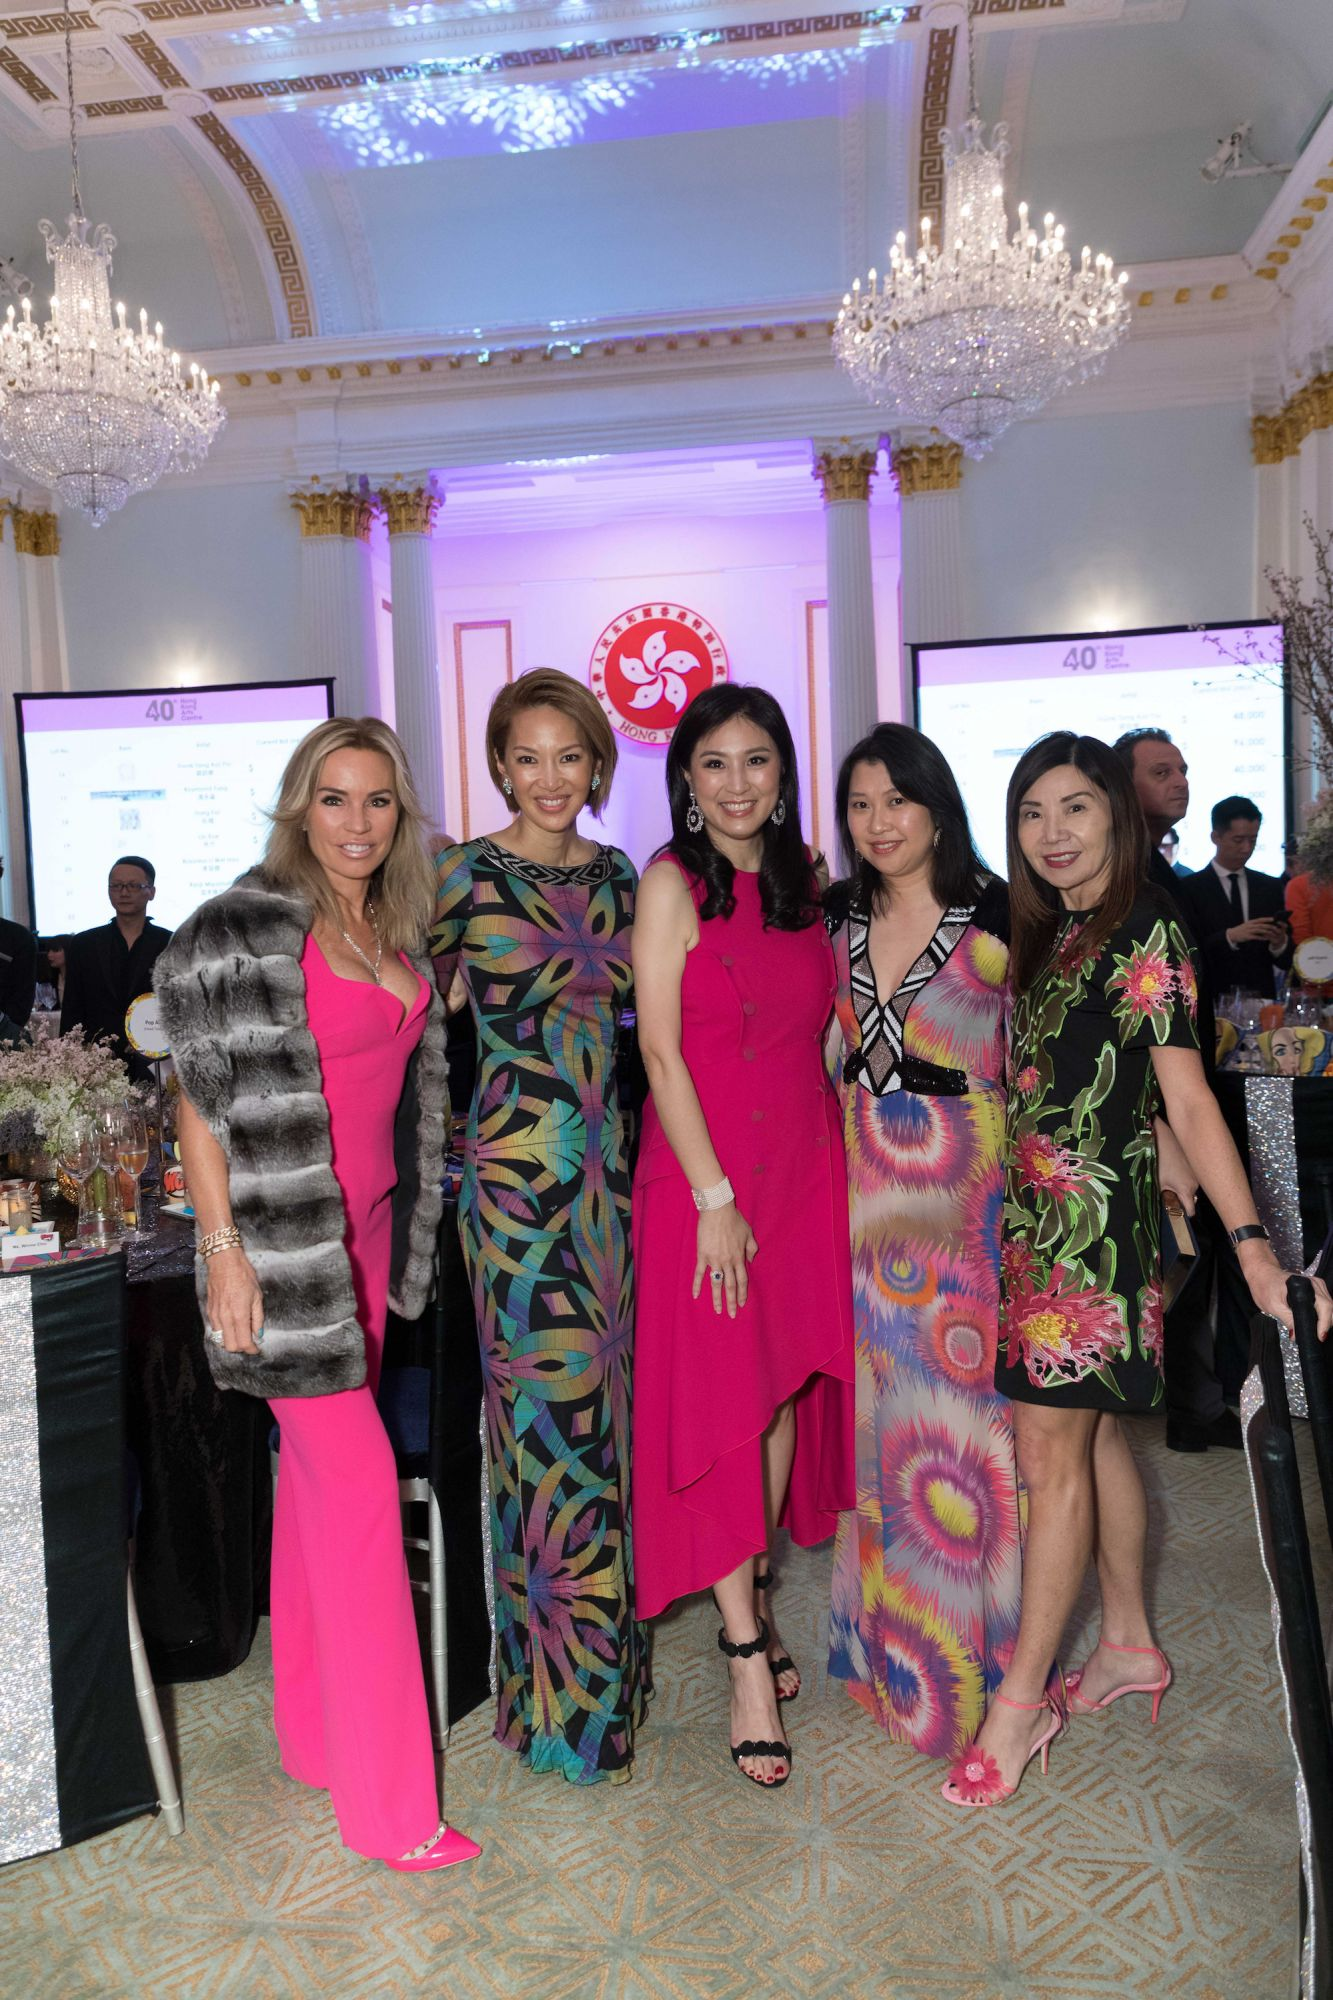 Annabelle Bond, Yolanda Choy-Tang, Leigh Tung-Chou, Peggy Yeoh, Esther Ma